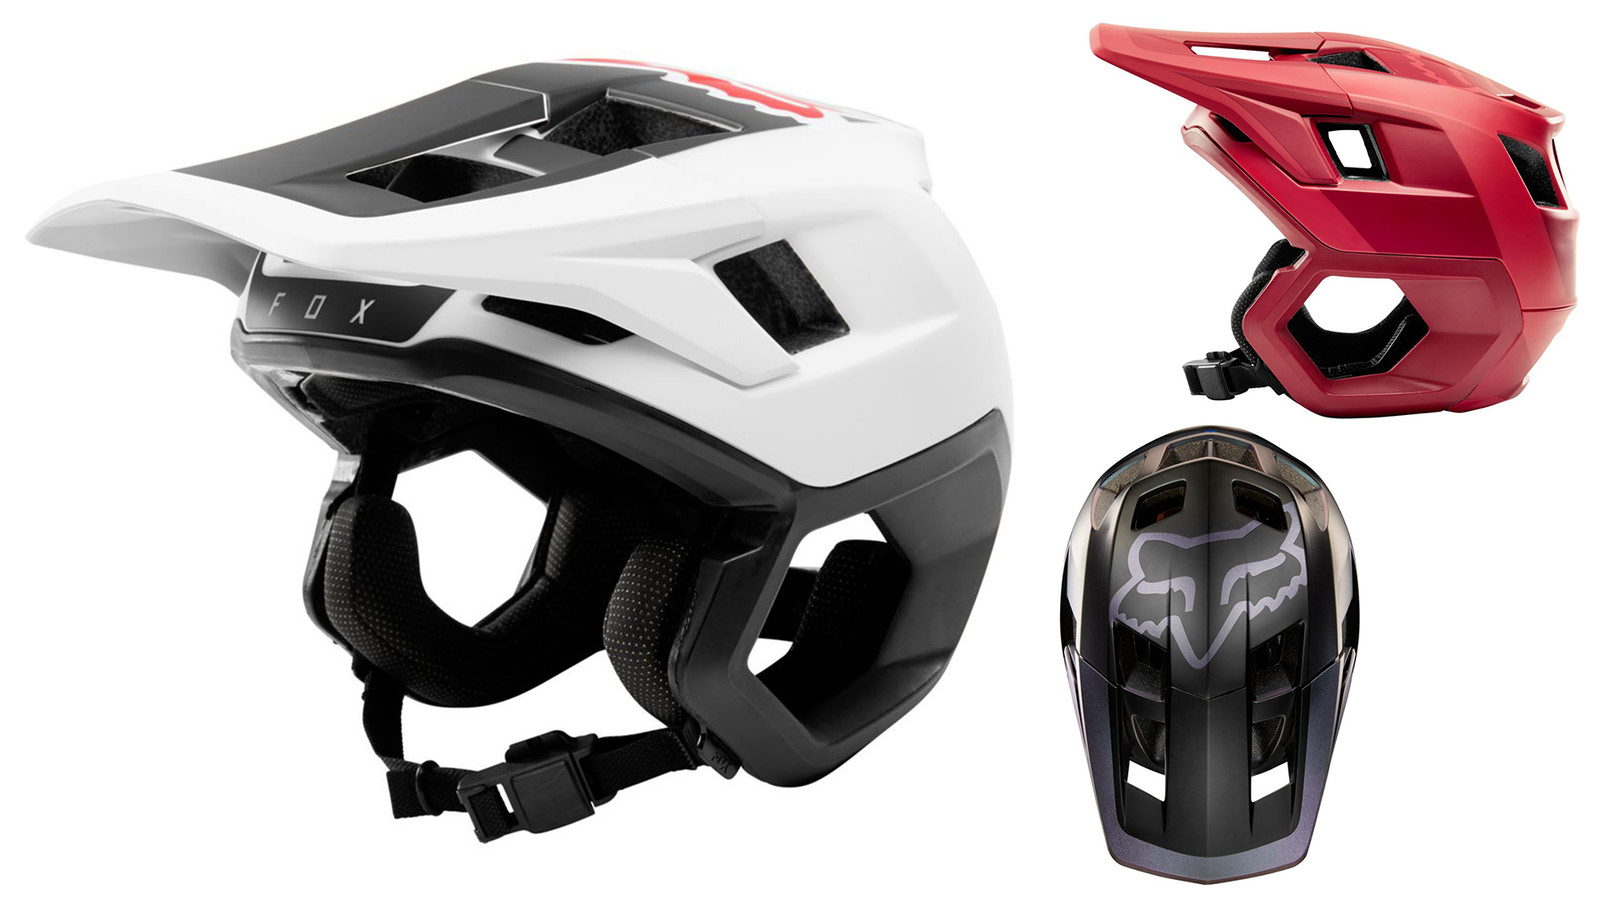 Fox Racing Introduces The Dropframe Helmet Mountain Bikes News Stories Vital Mtb